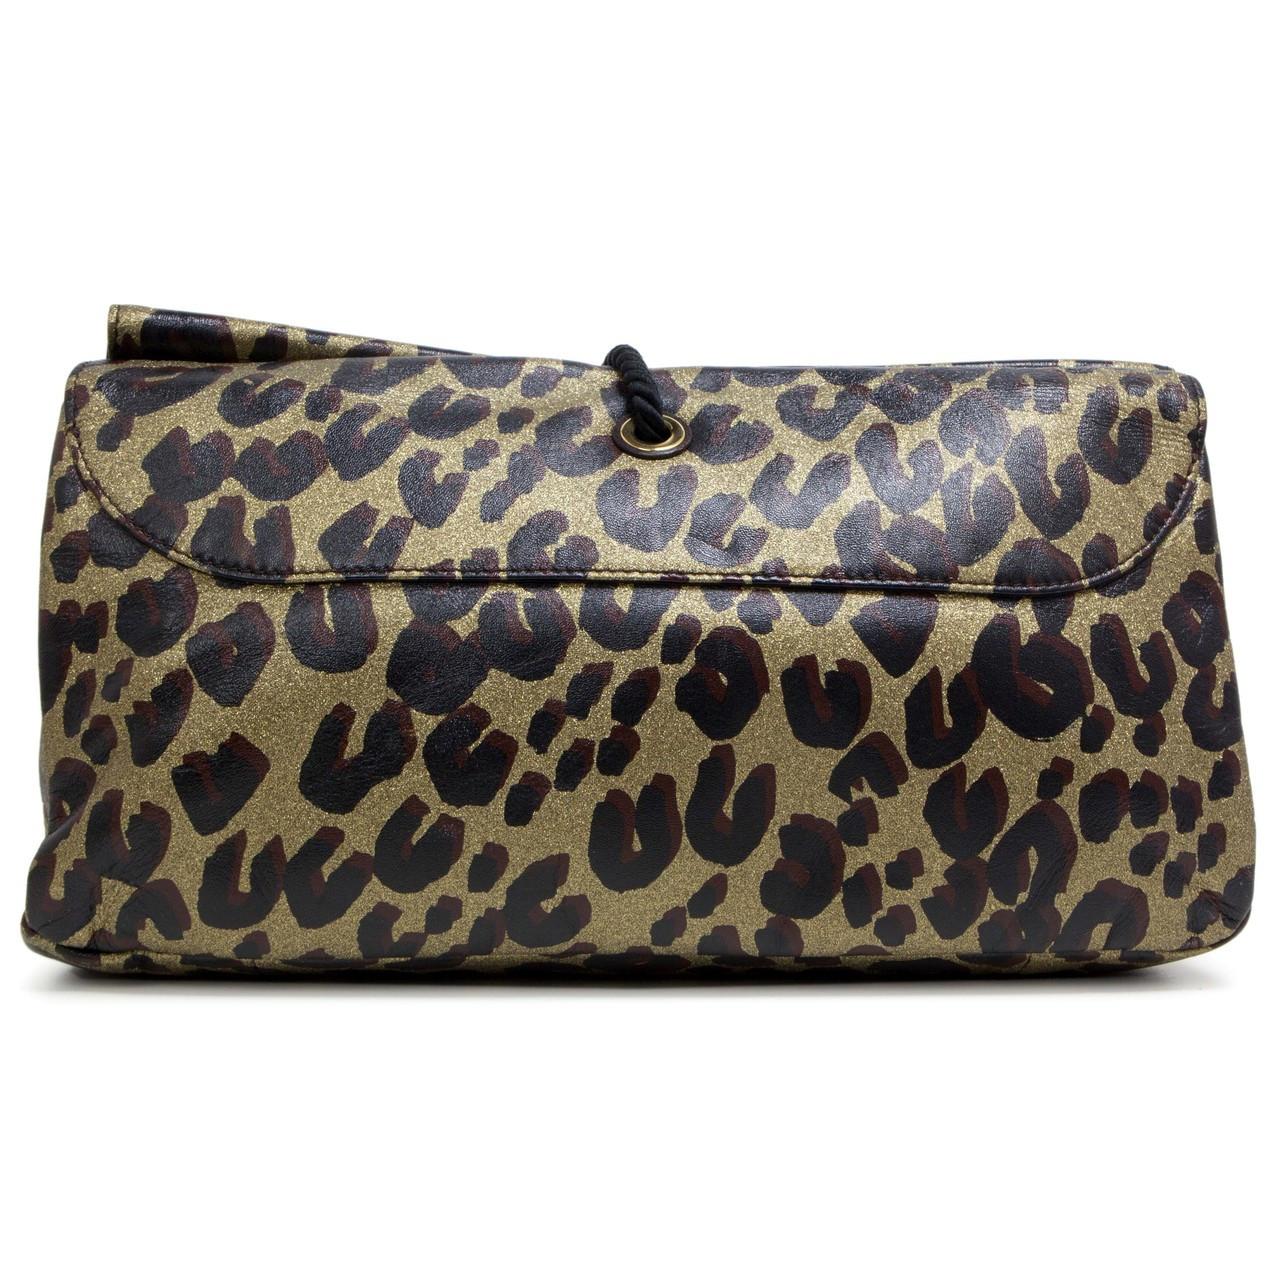 c0b88816dfd7 Louis Vuitton Leopard Nocturne African Queen Clutch - modaselle